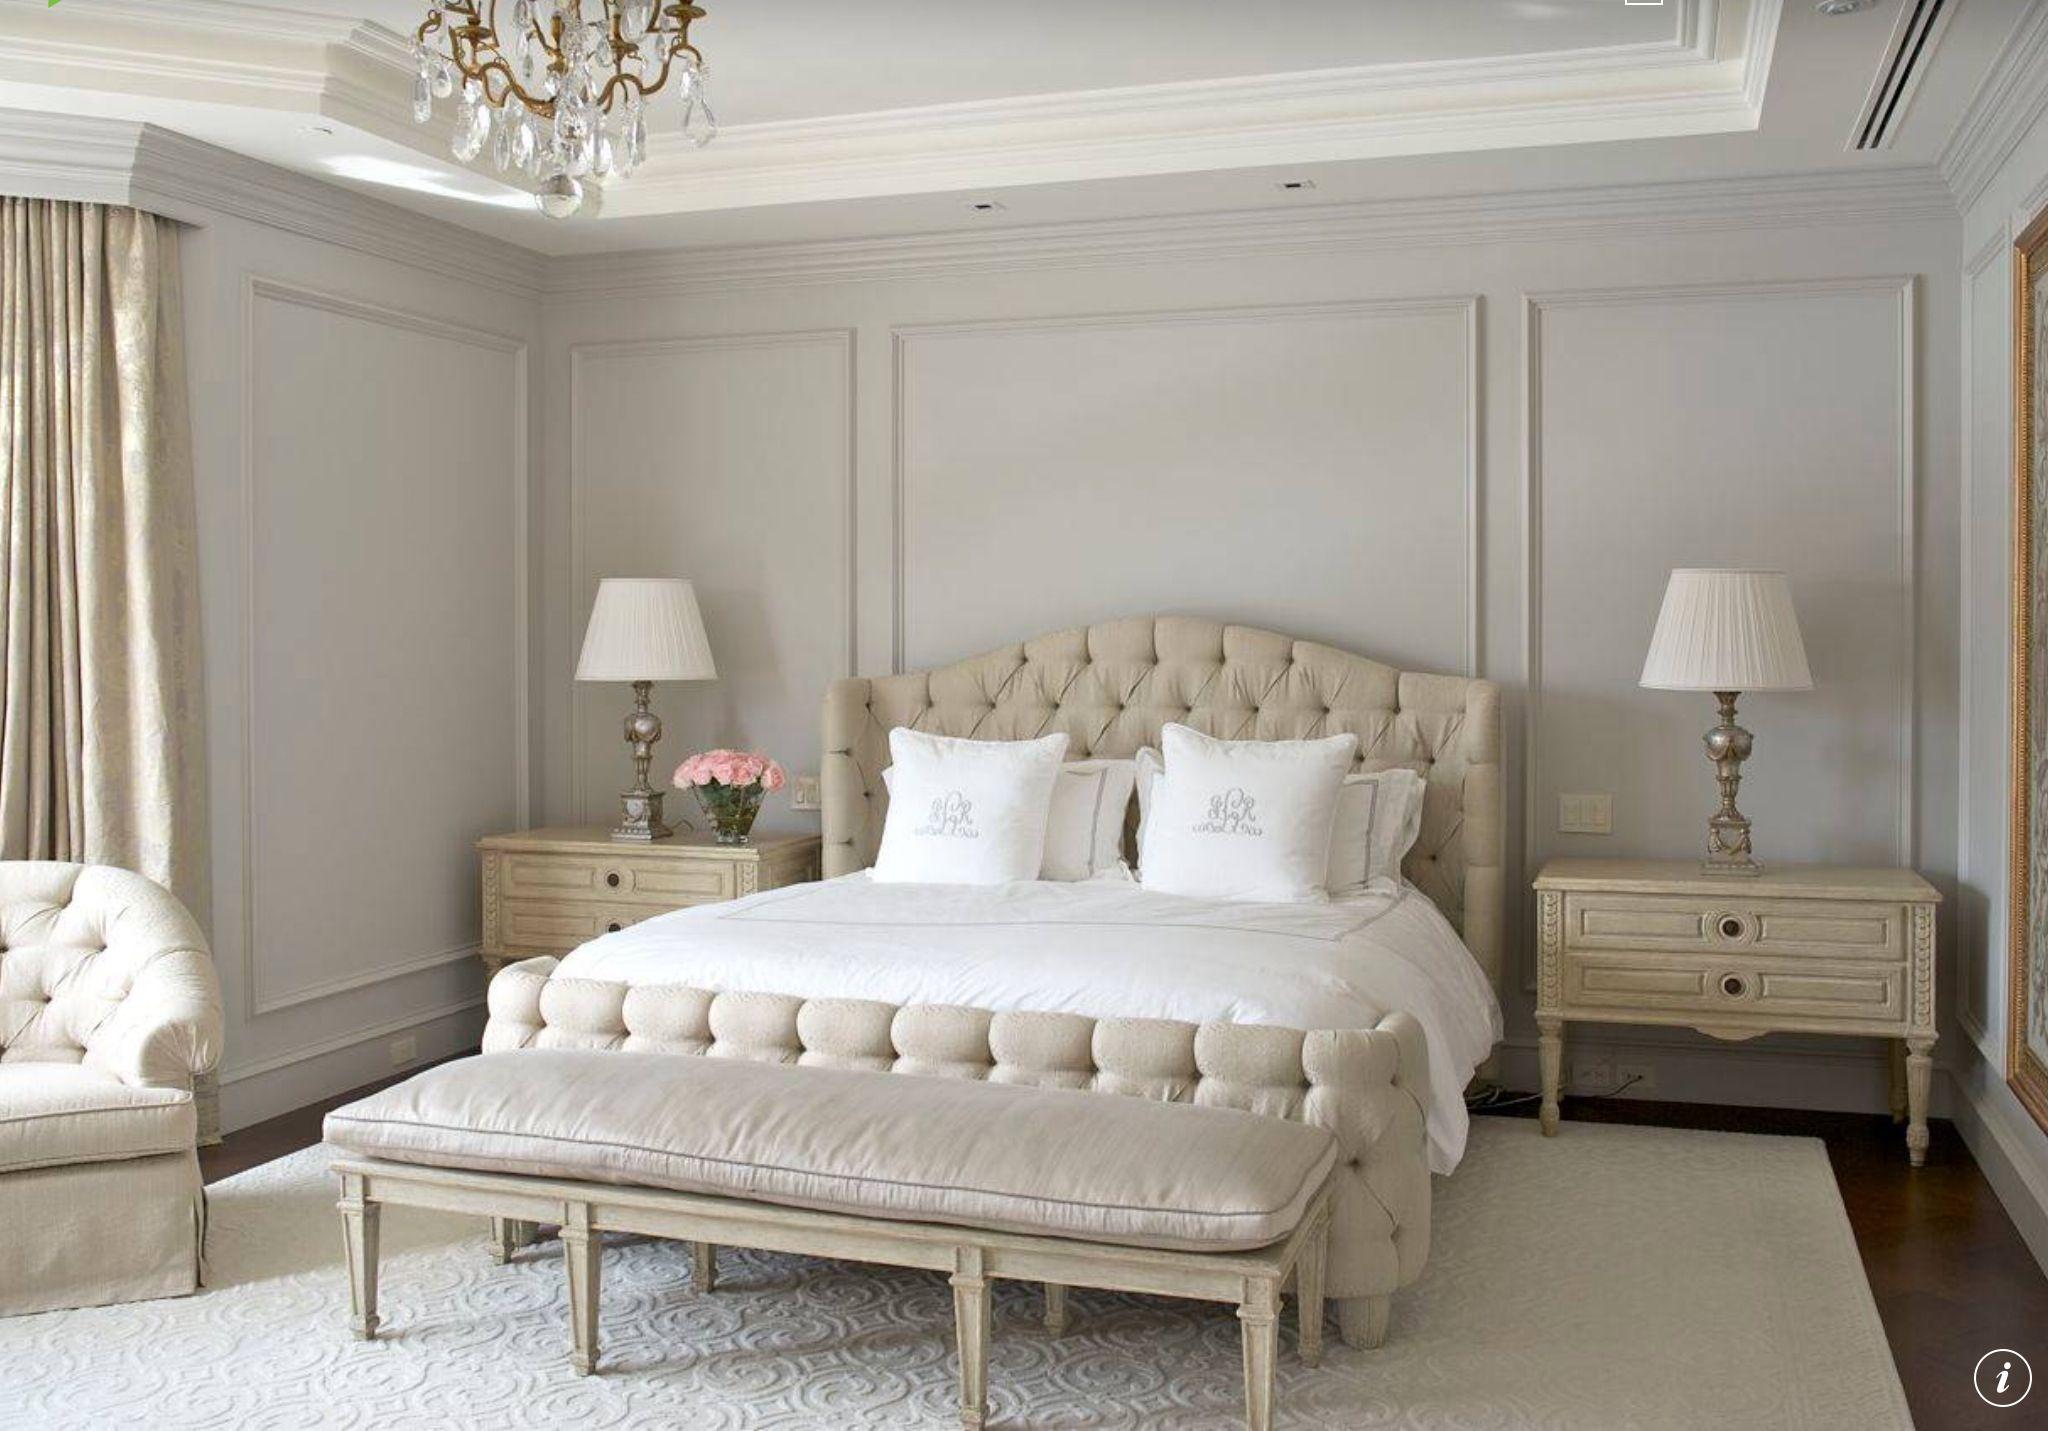 Master bedroom ideas grey  Grey Master Bedroom Ideas  Bedroom wall colors Gray bedroom and